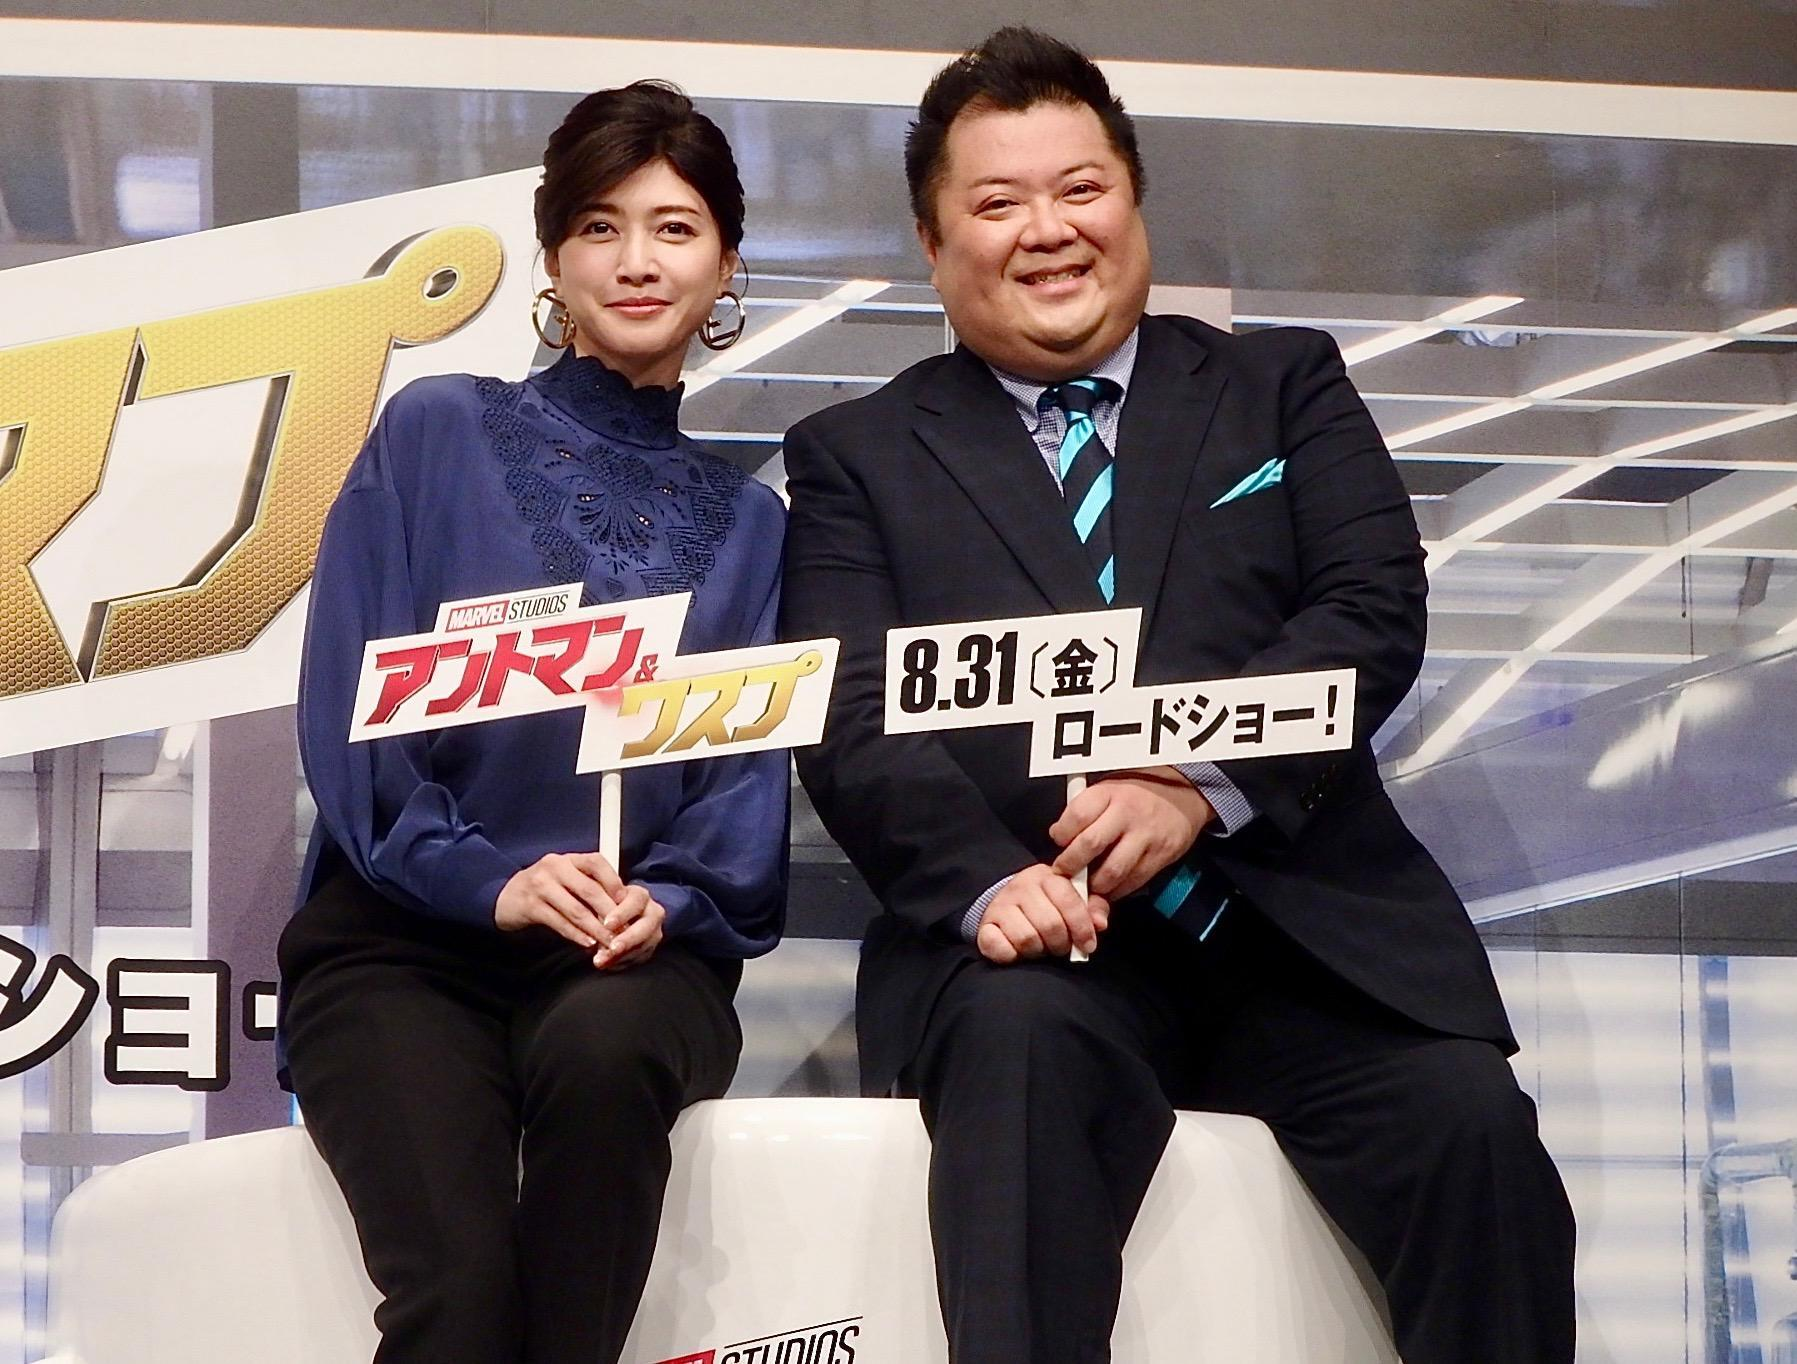 http://news.yoshimoto.co.jp/20180708154325-db6aecfa85dc5f5d75b18e5d063a67f4d10ceeaf.jpg